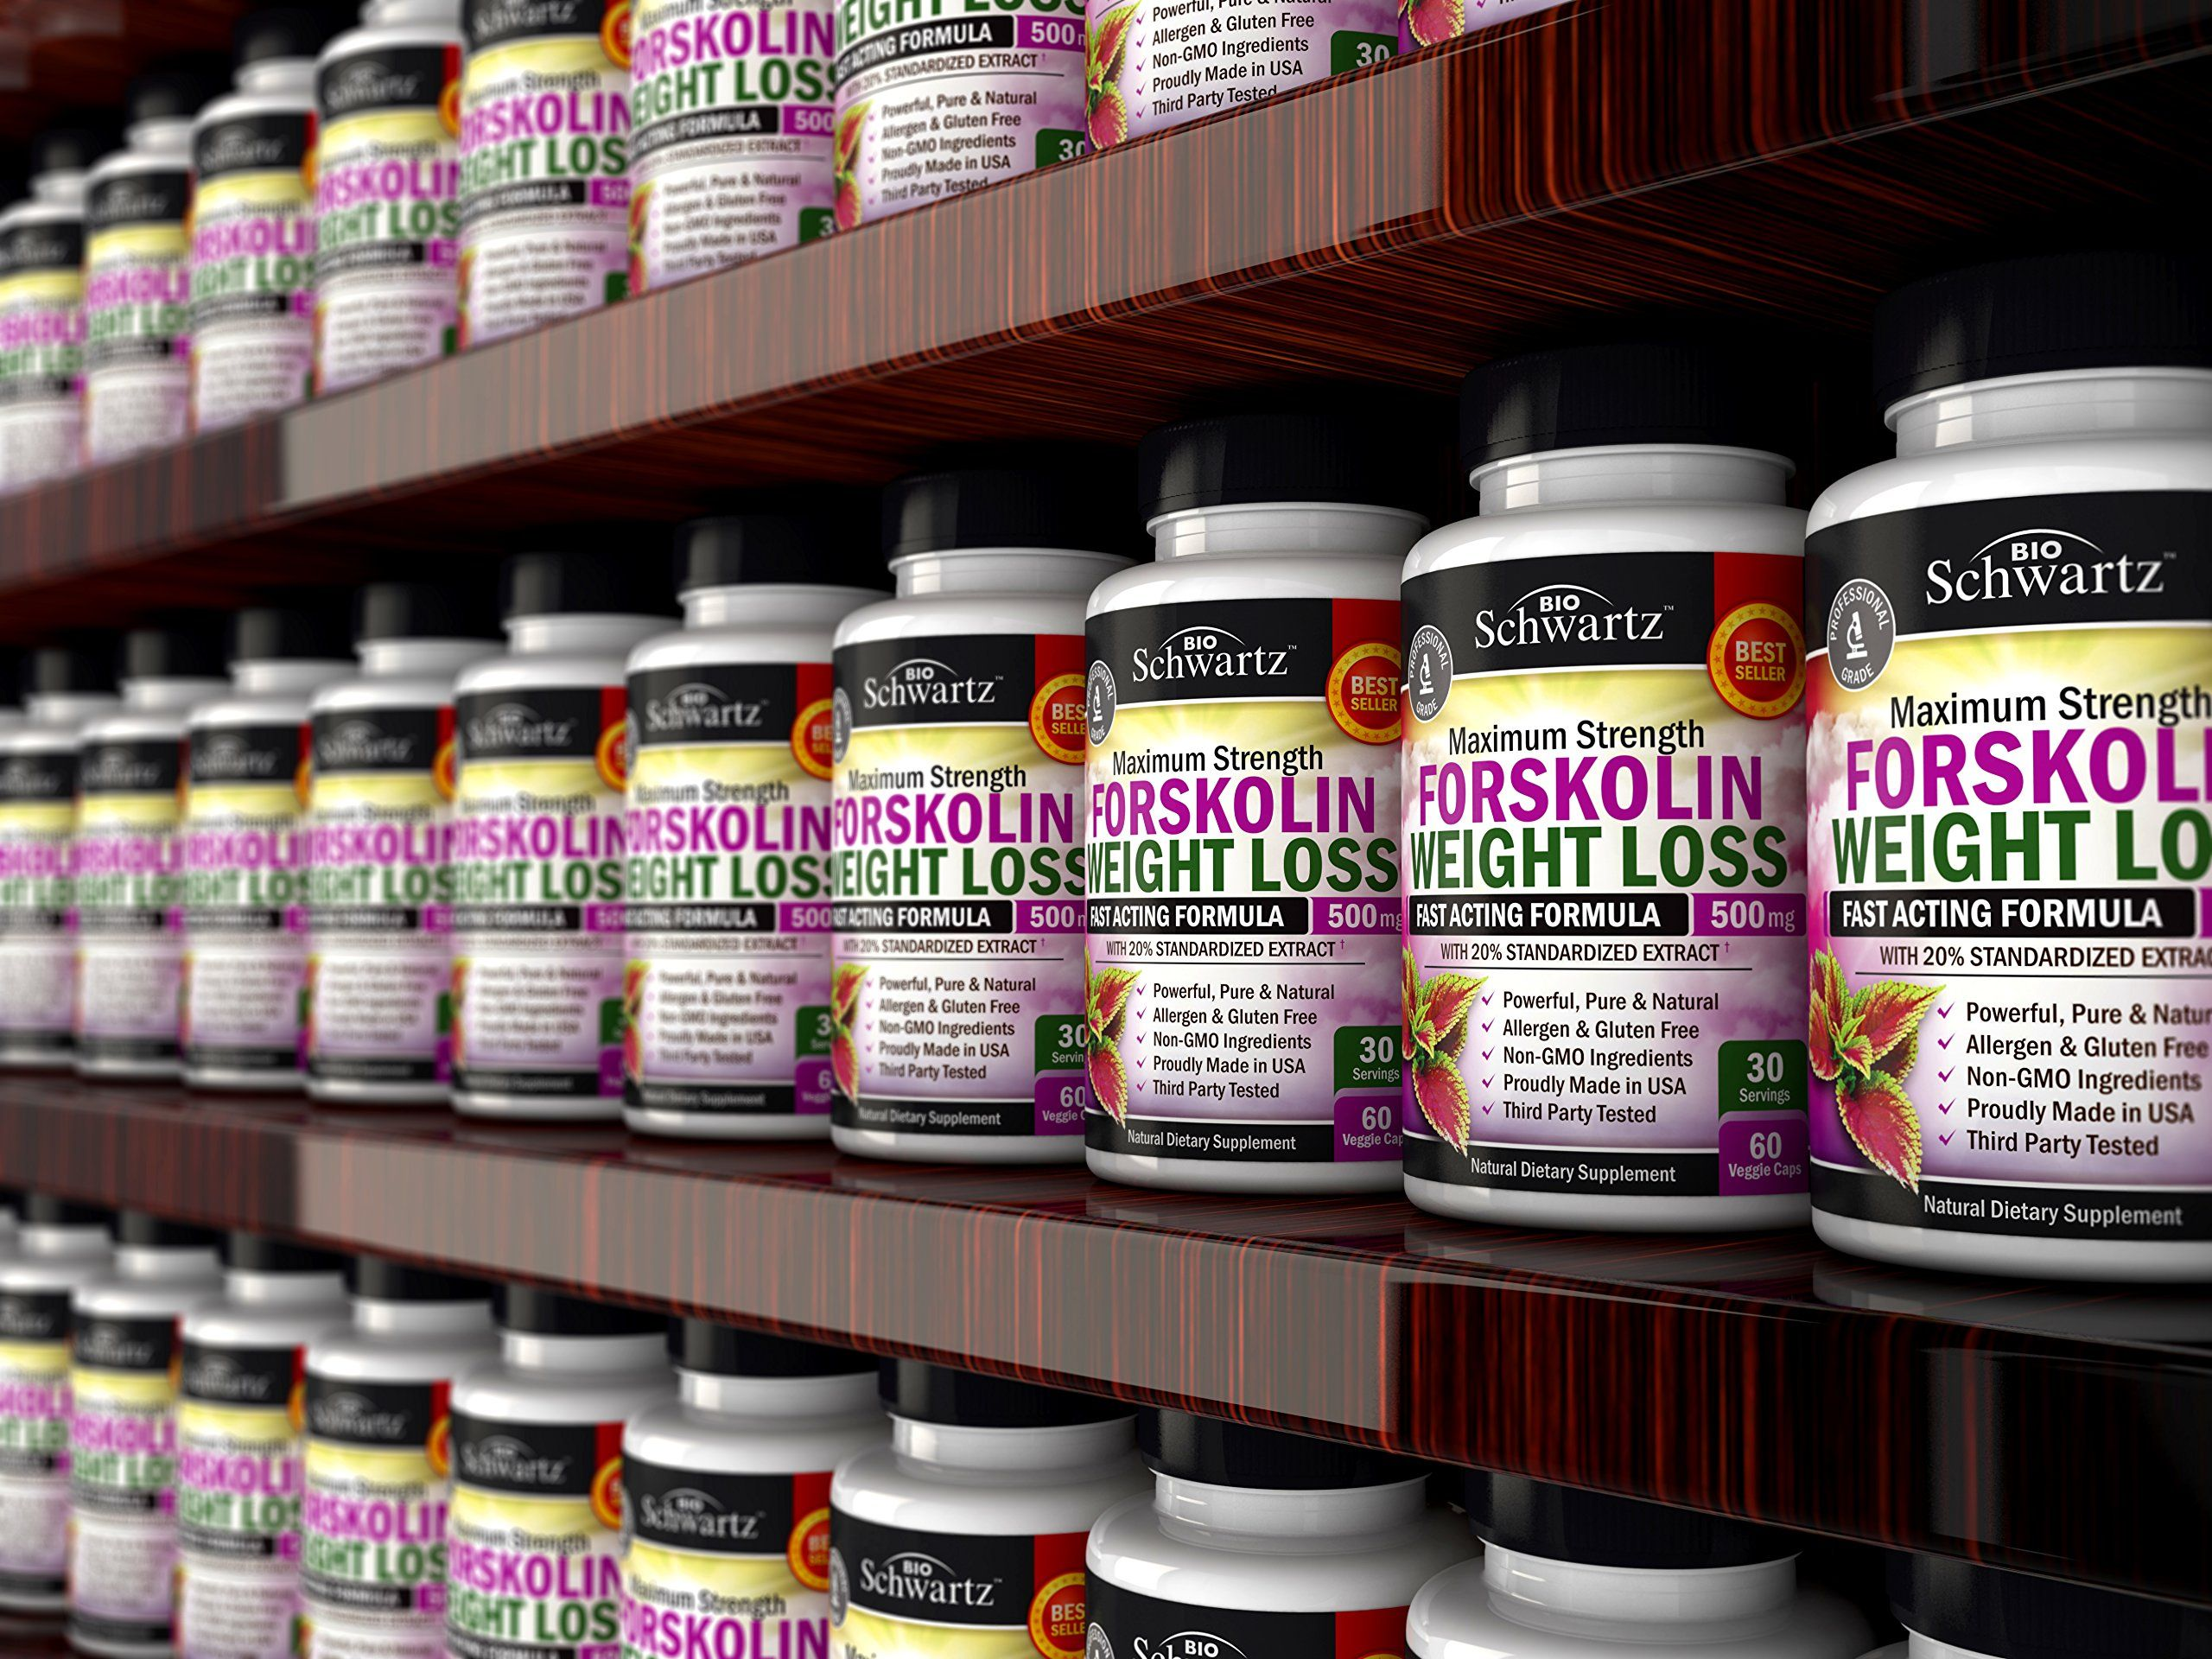 Alli Diet Pill Amazon forskolin extract for weight loss. pure forskolin diet pills